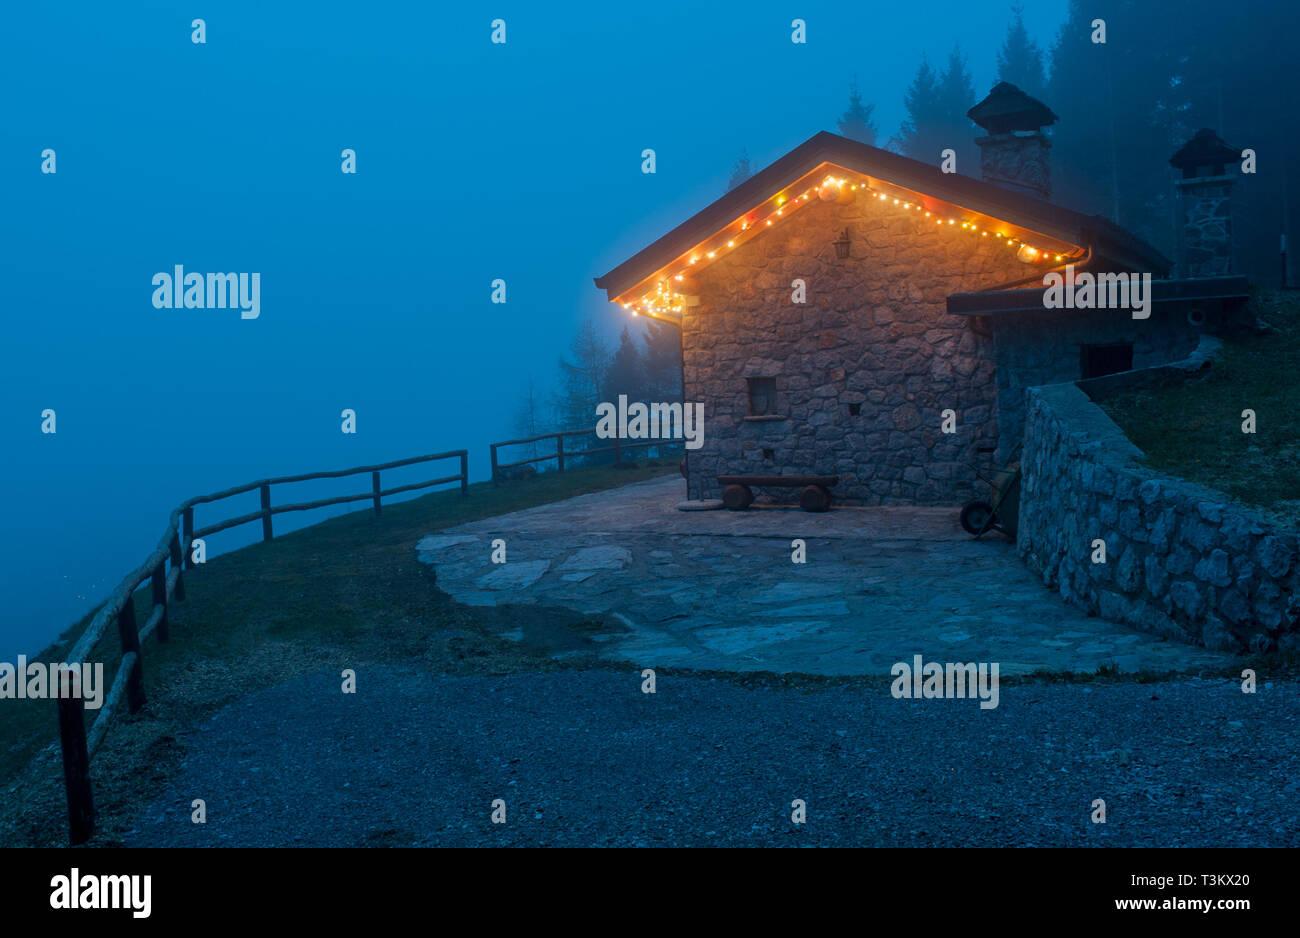 mountain retreat illuminated for new year - Stock Image